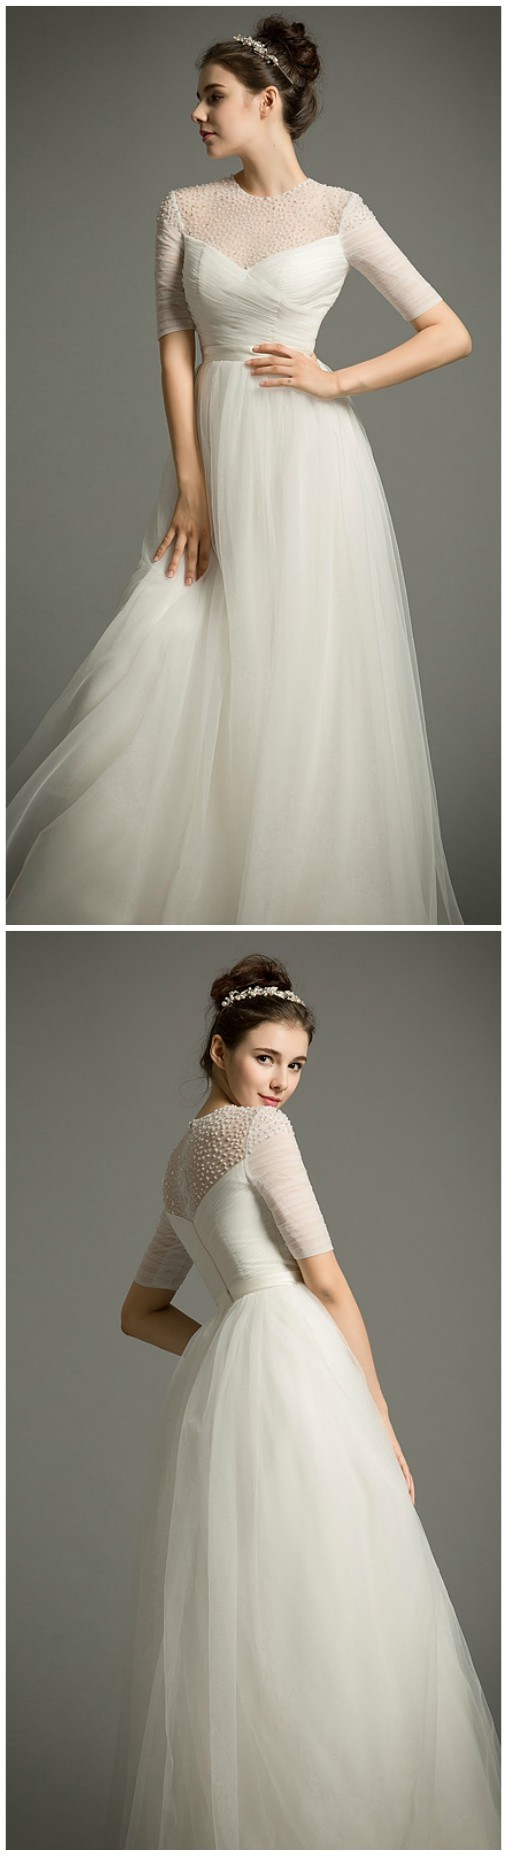 Flowy beach wedding dress empire scoop neck floorlength tulle with